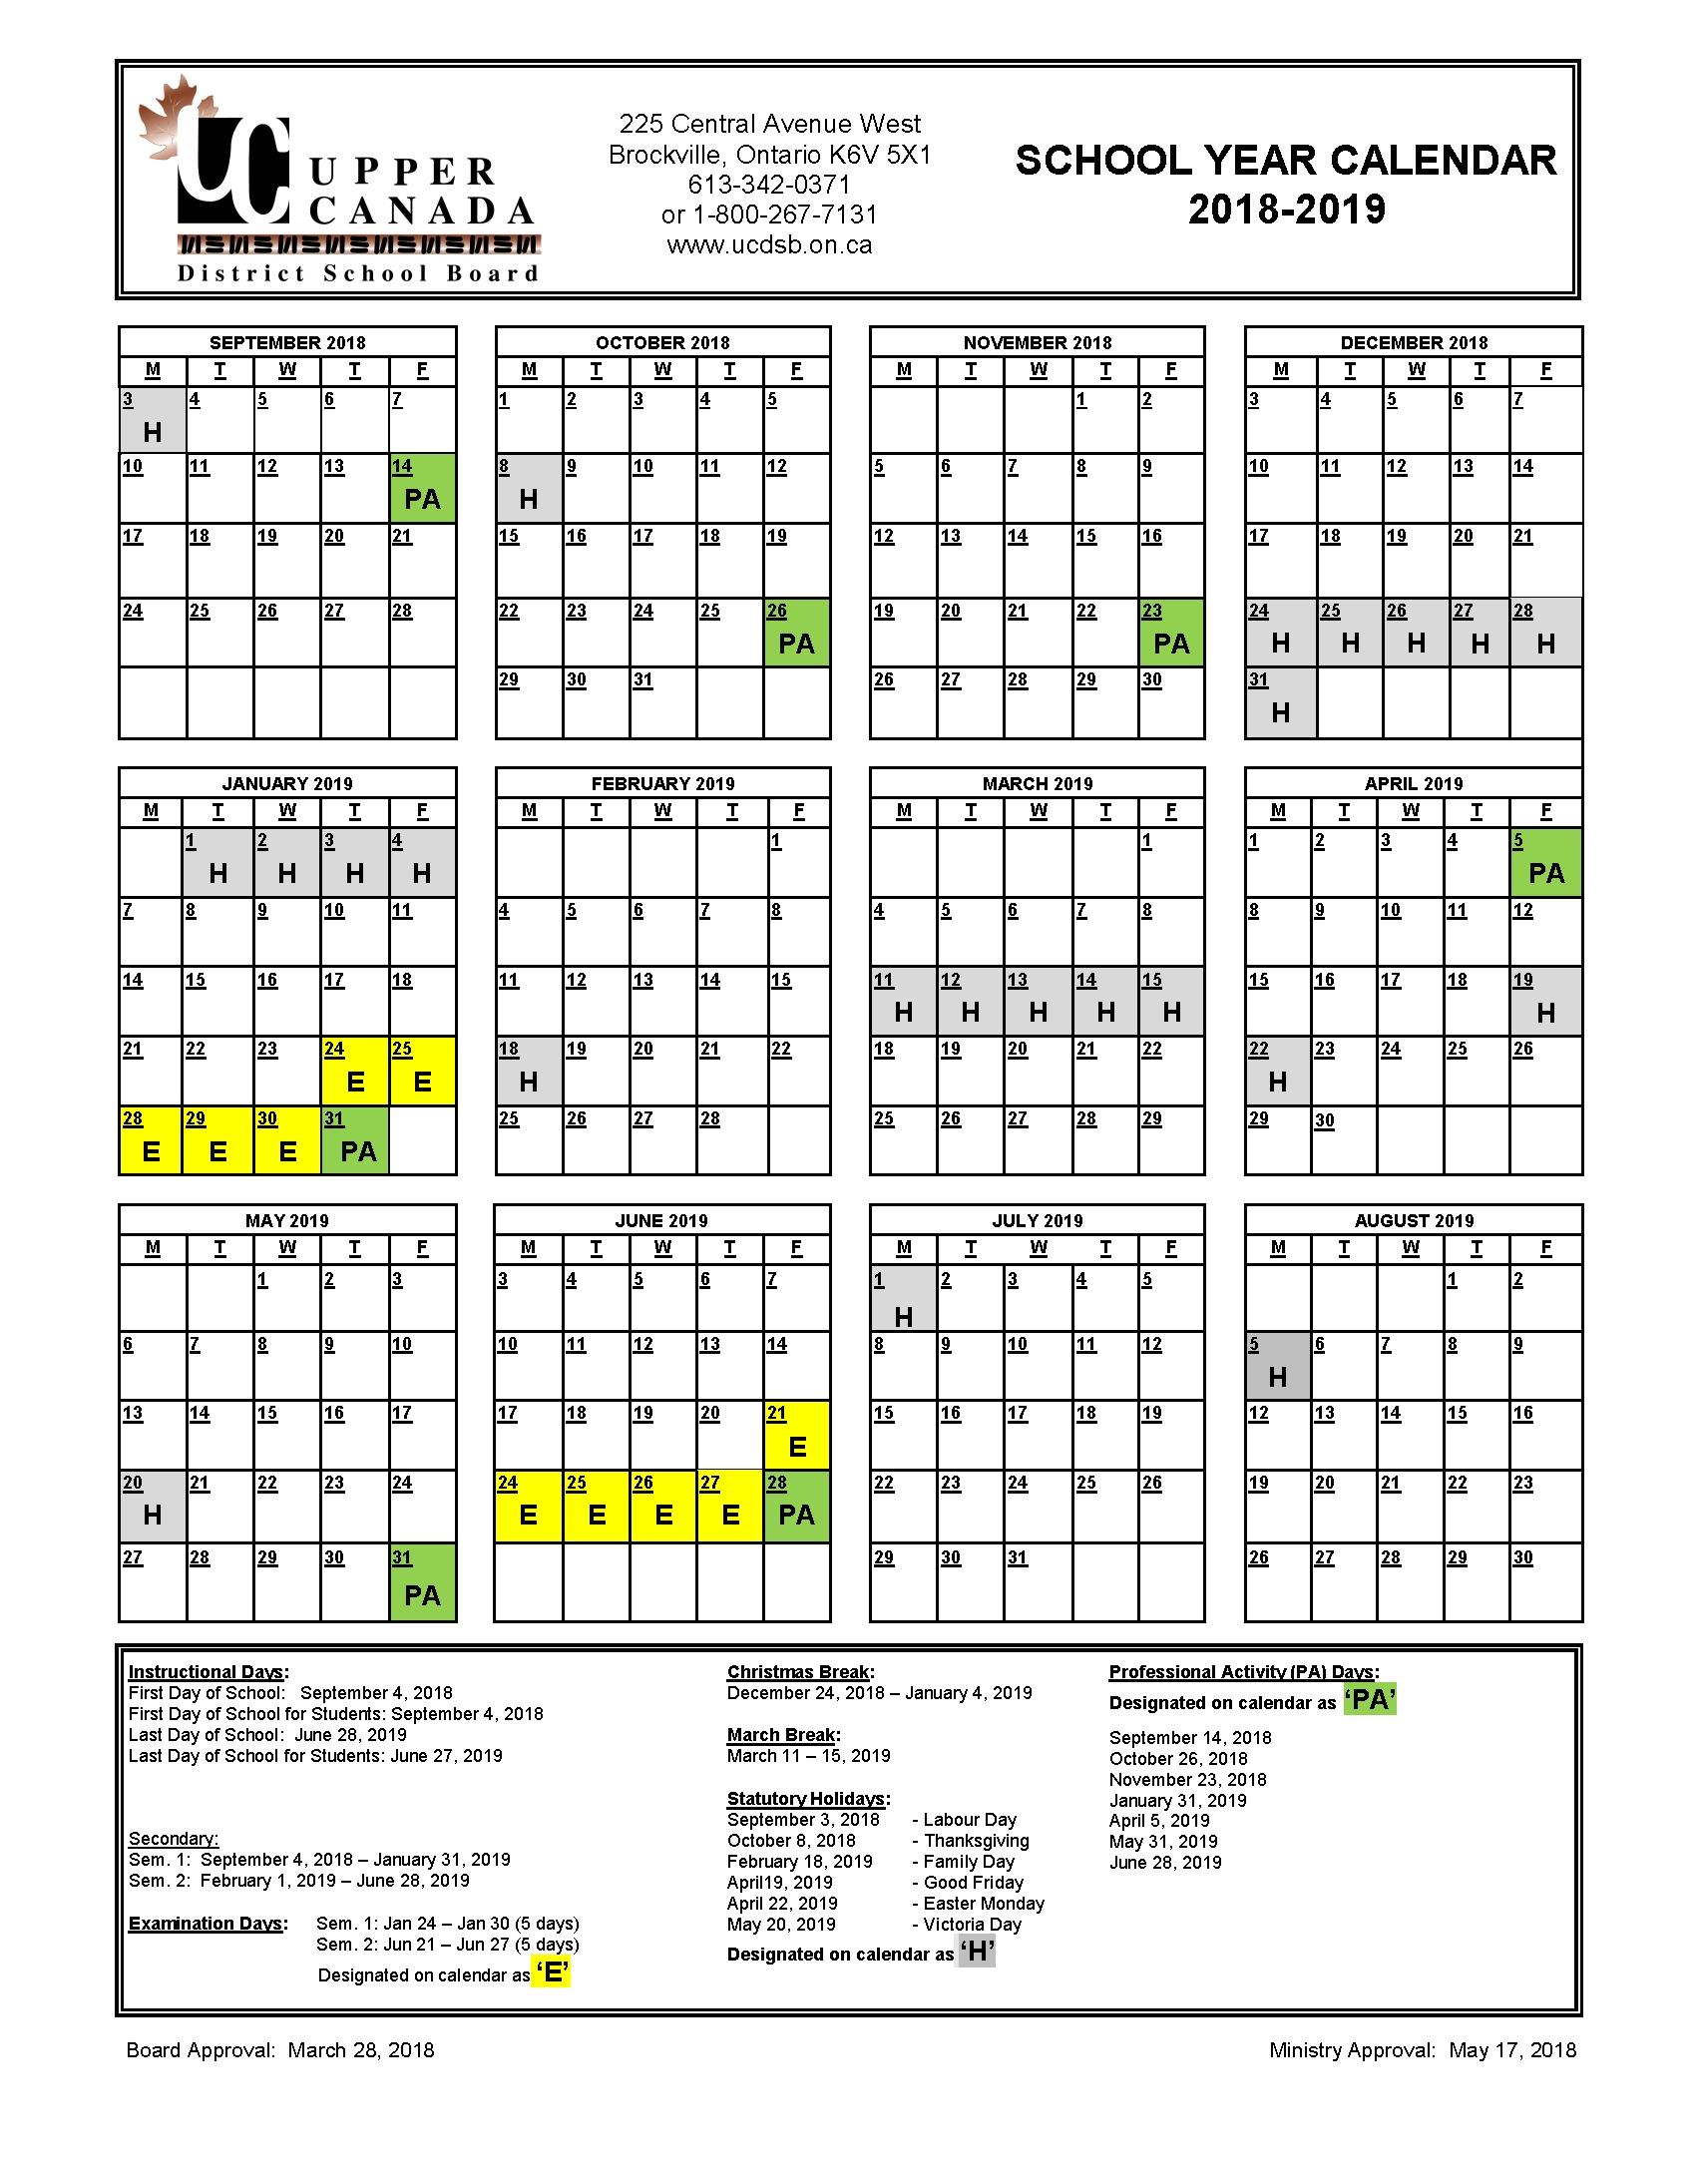 2018 2019 School Year Calendar – Upper Canada District School Board Calendar 2019 Qu